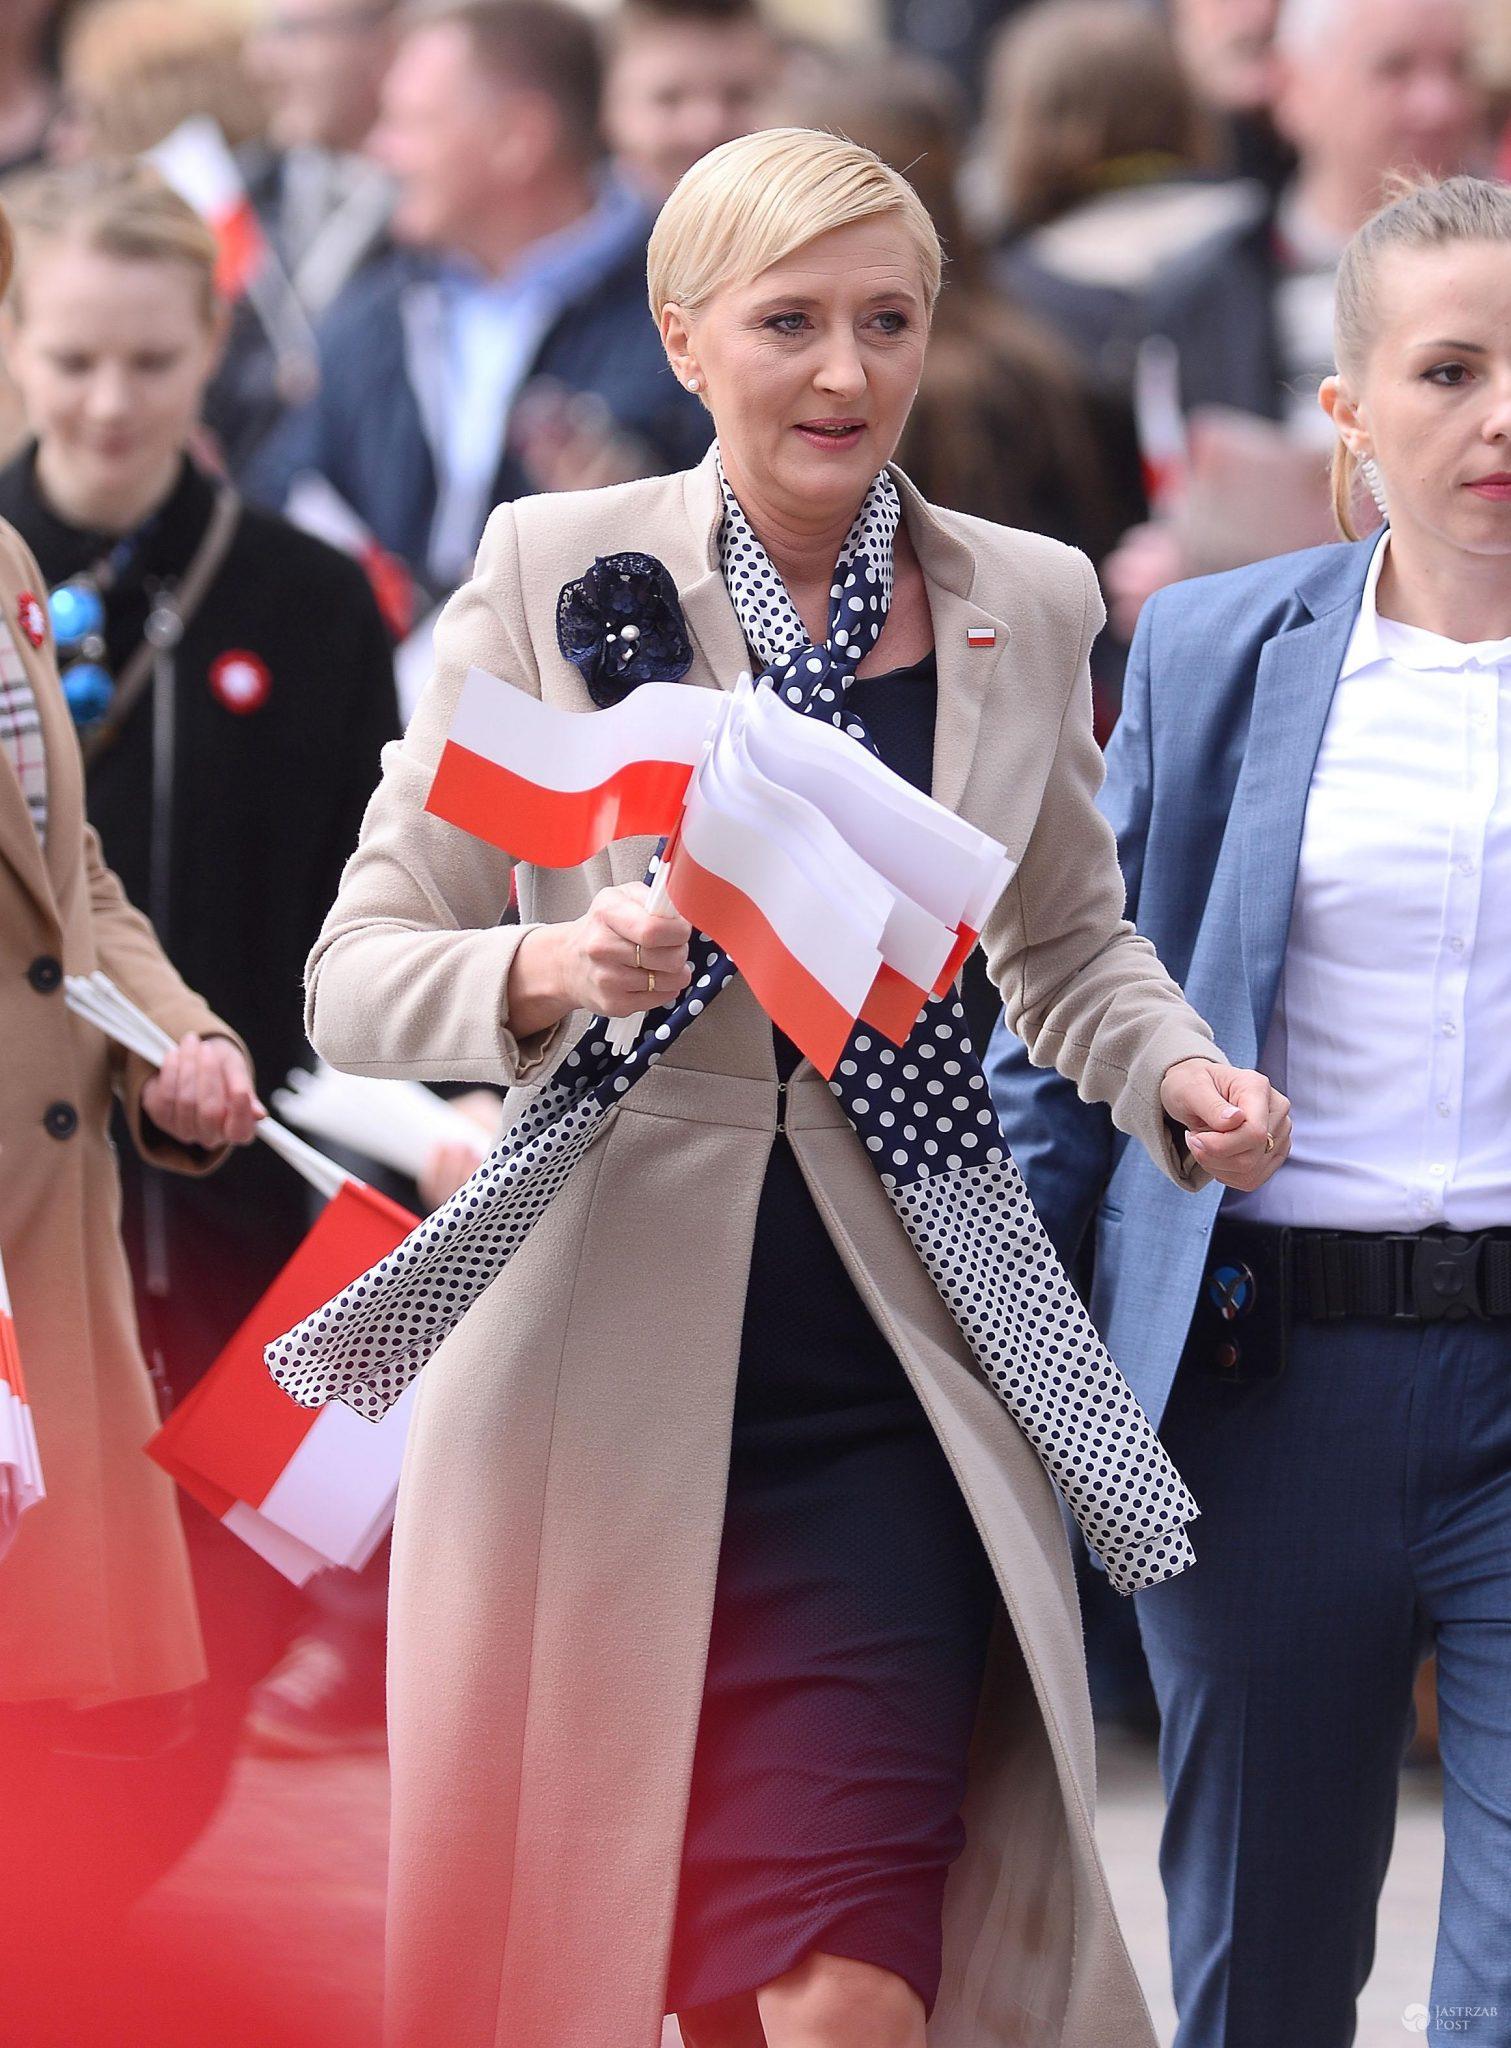 Agata Duda z flagami